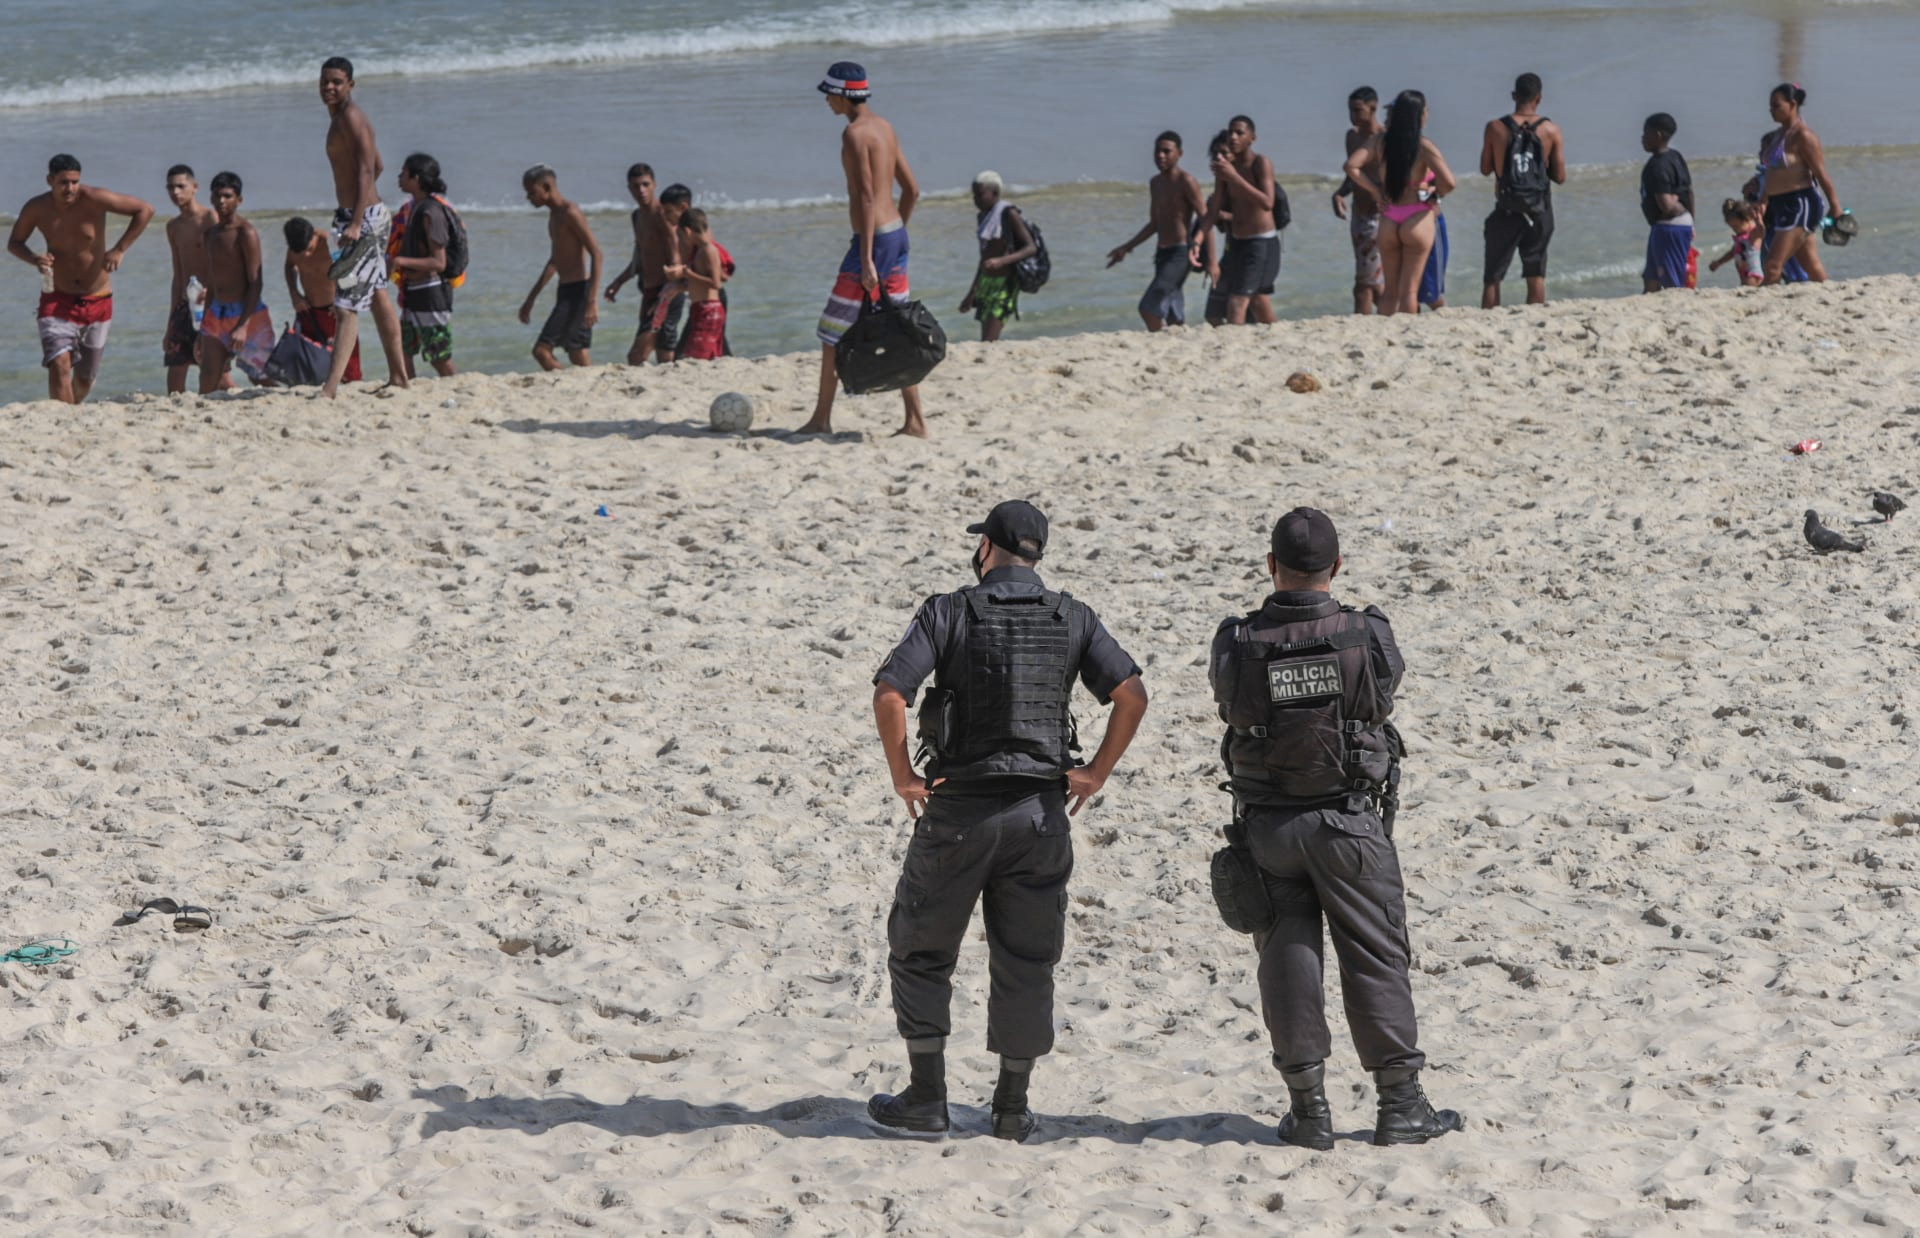 رجلا شرطة يراقبان مصطافين لدى مغادرتهم شاطىء في ريو دي جانييرو